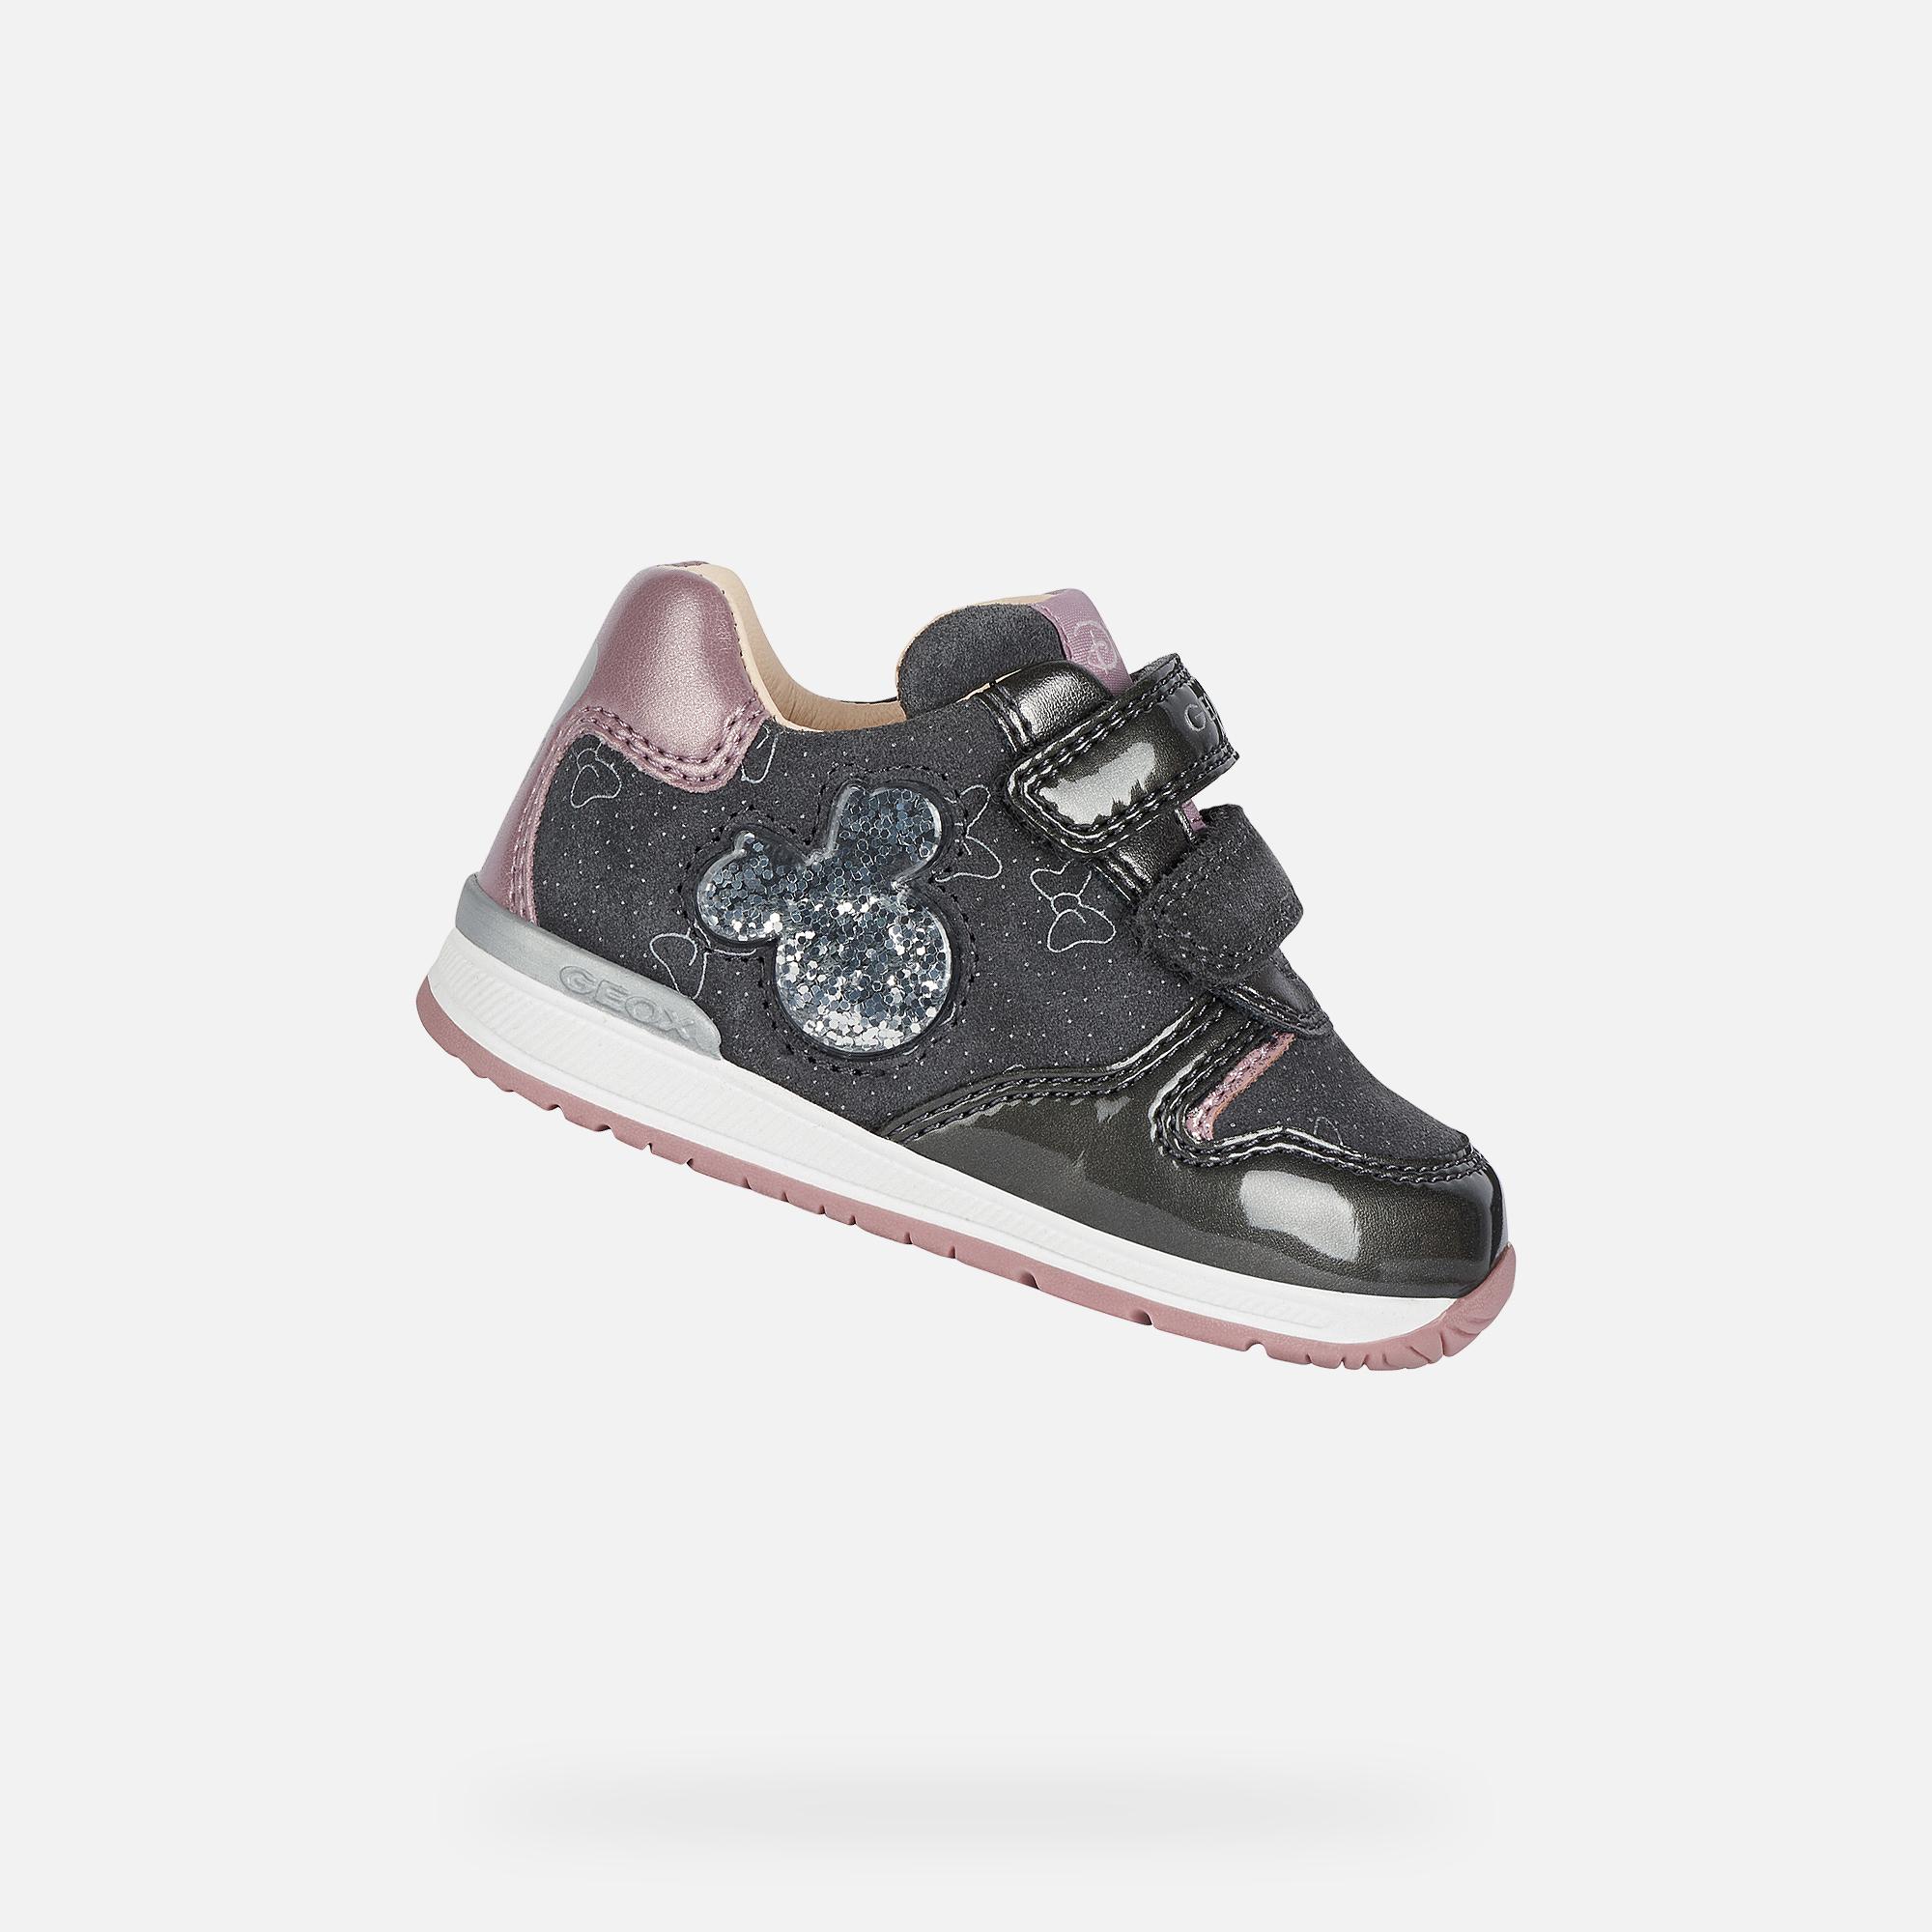 leninismo Acumulativo triatlón  Geox RISHON GIRL Baby Girl: Grey First Steps   Geox X Disney